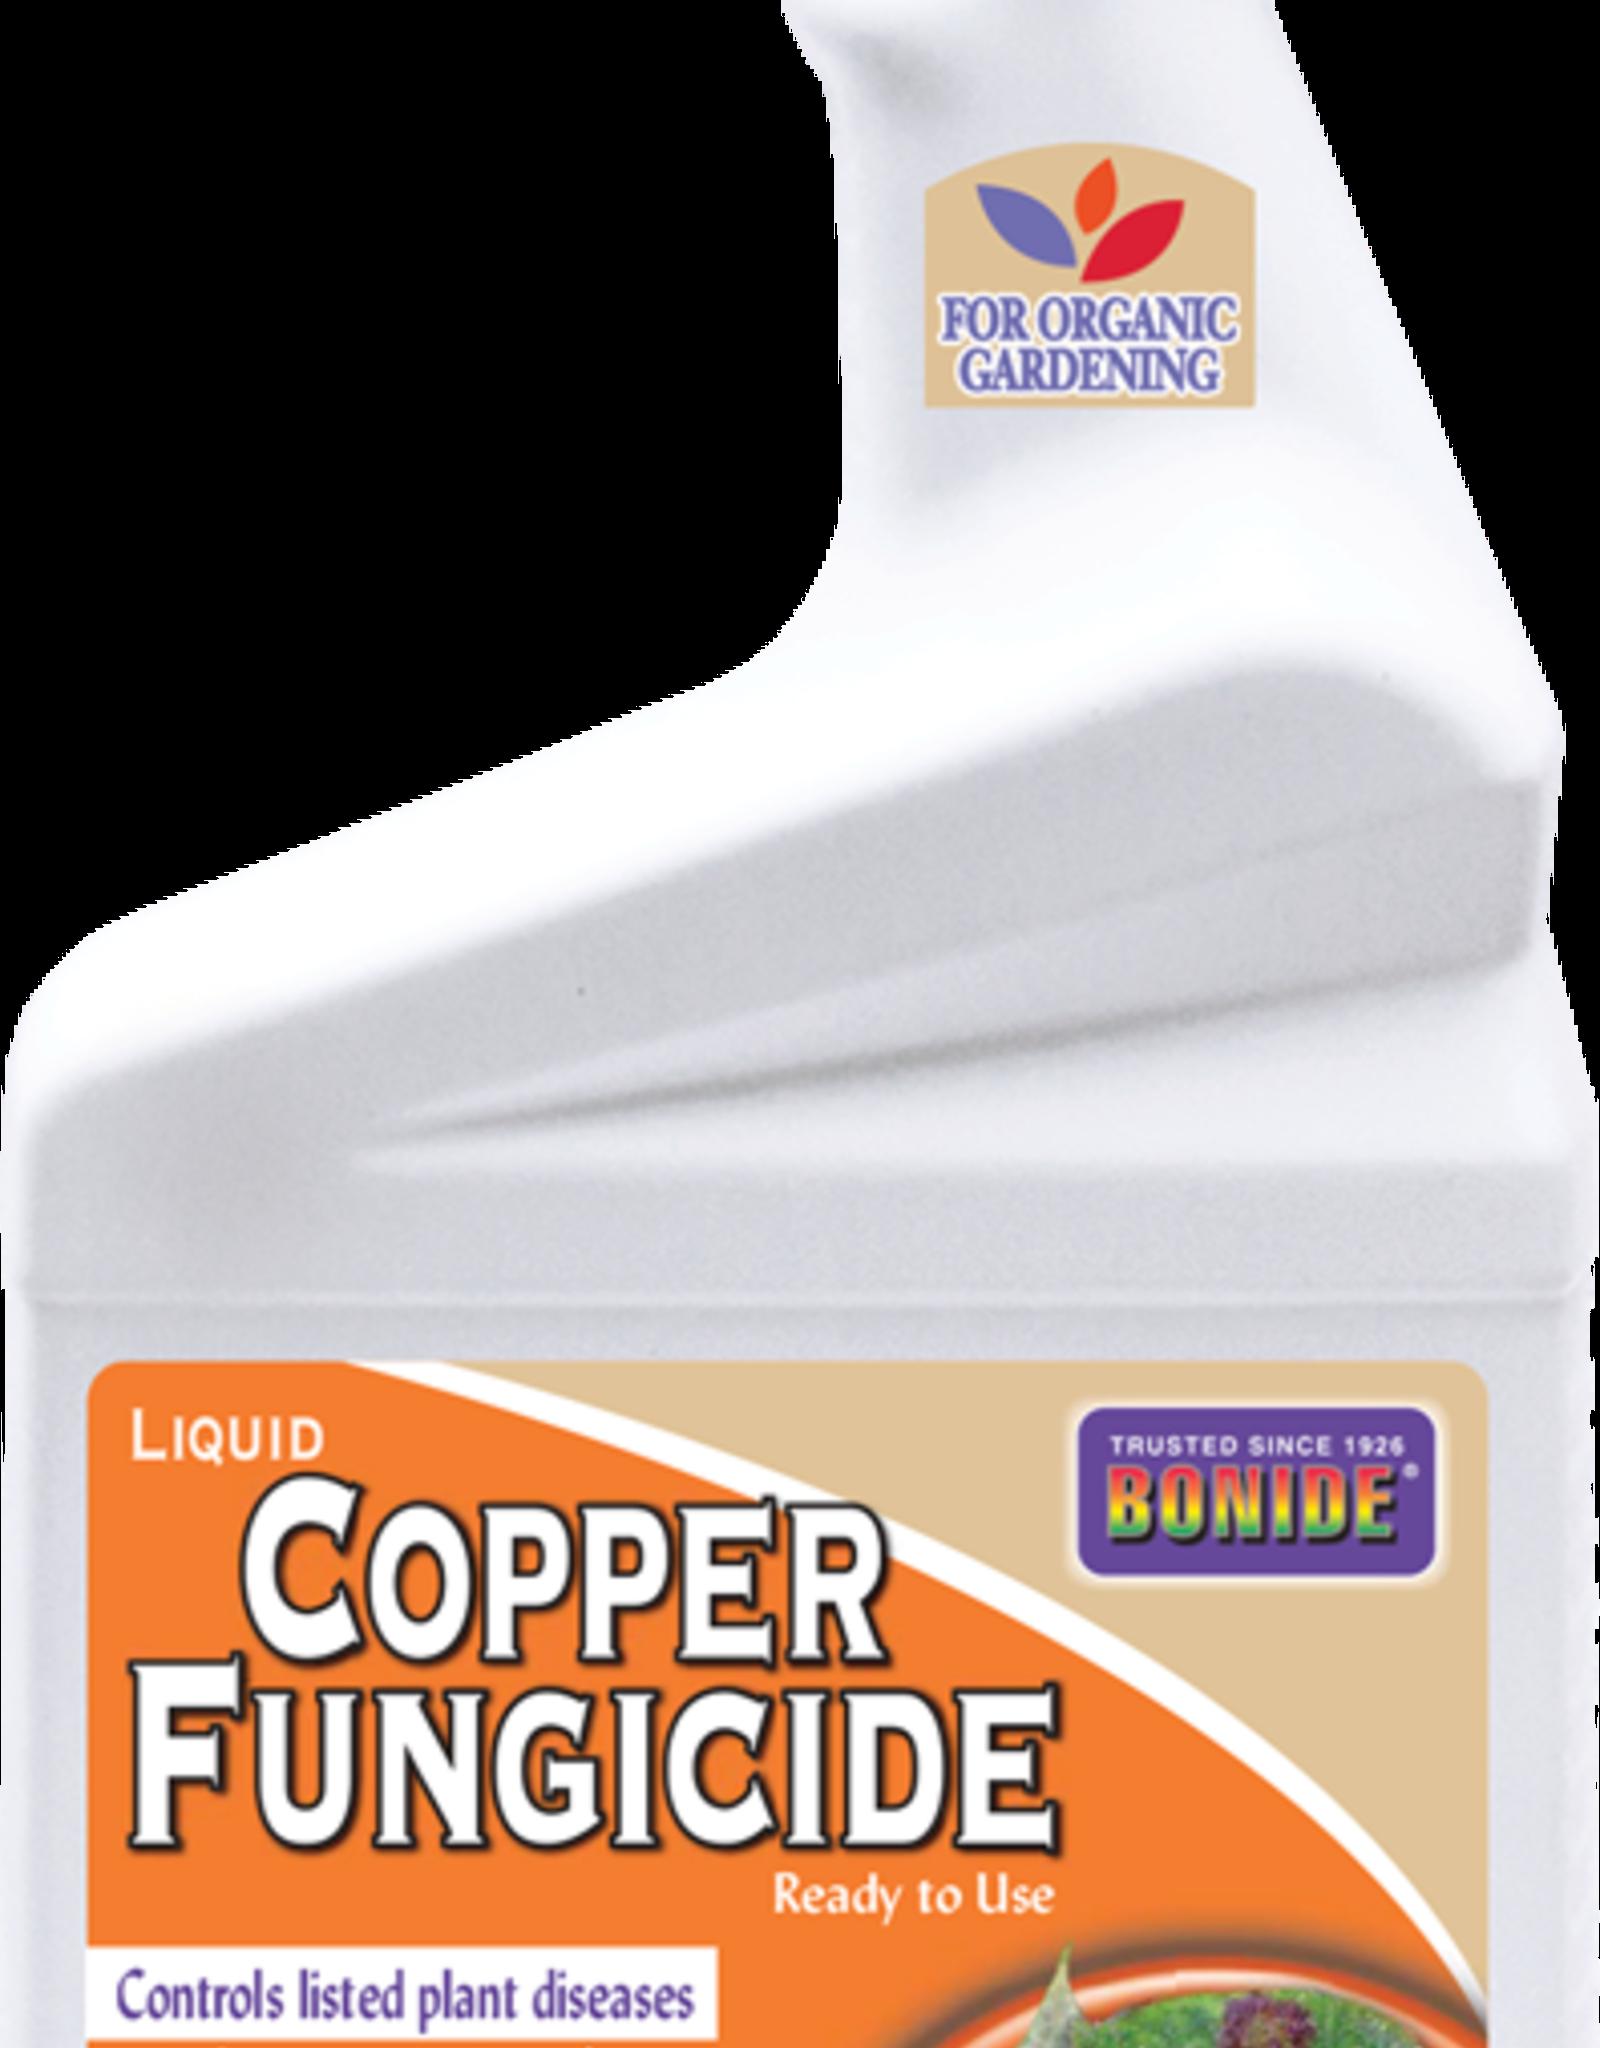 BONIDE PRODUCTS INC     P BONIDE COPPER FUNGICIDE (READY TO USE) QT 32OZ